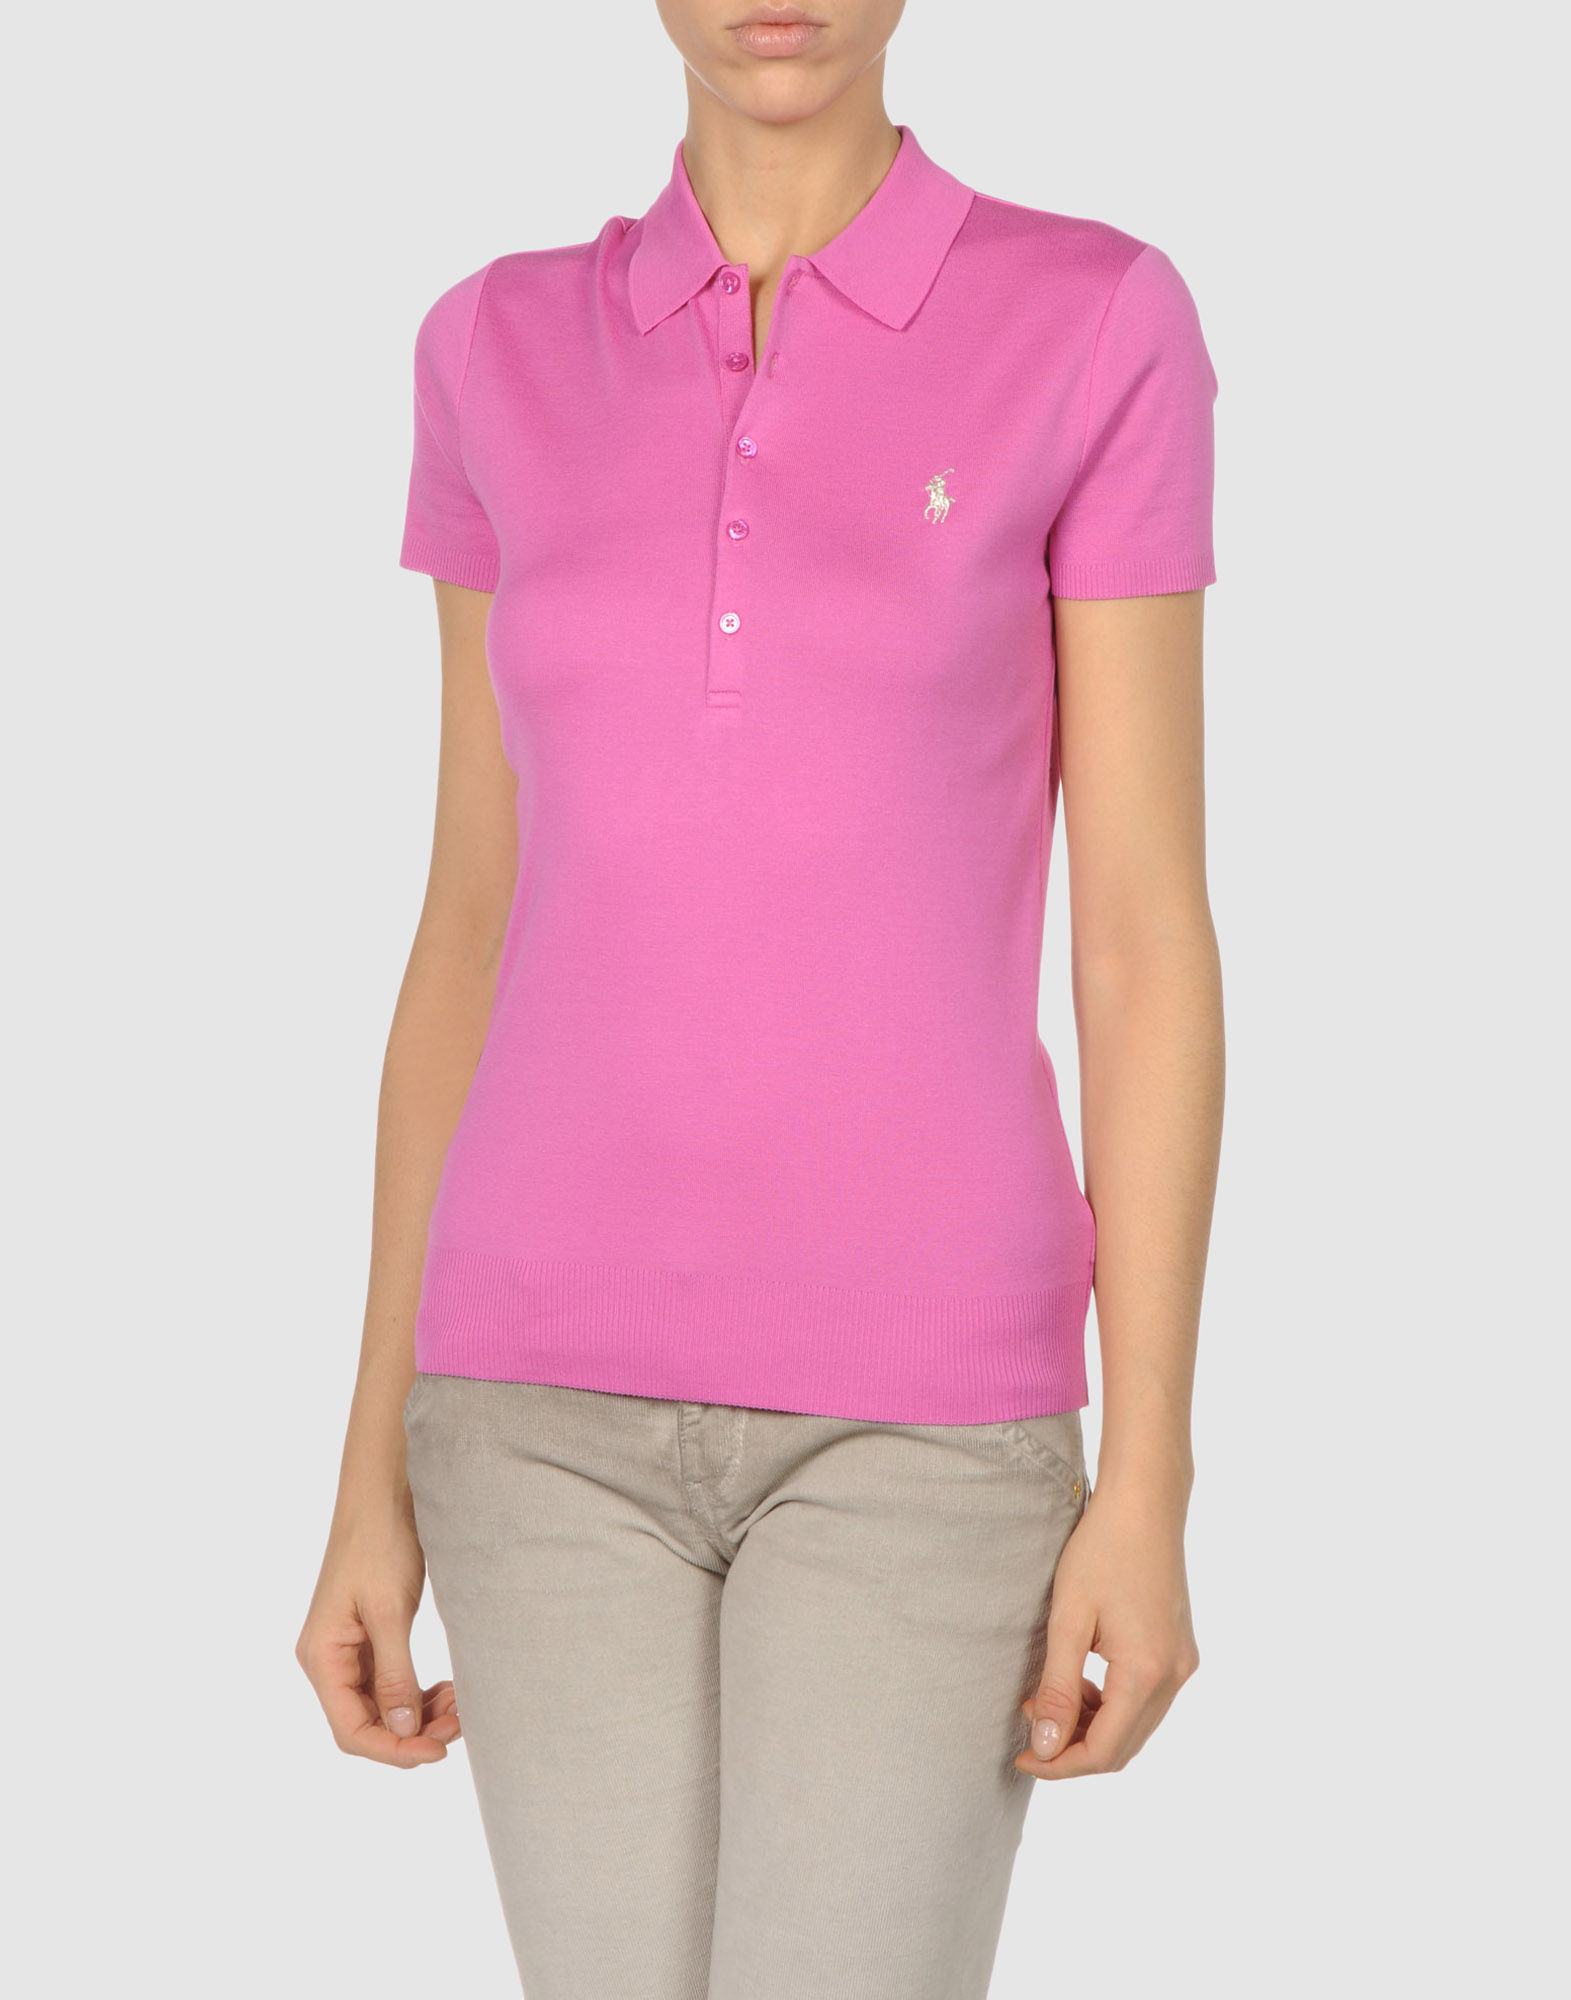 Ralph lauren black label polo shirt in pink purple lyst for Black ralph lauren shirt purple horse